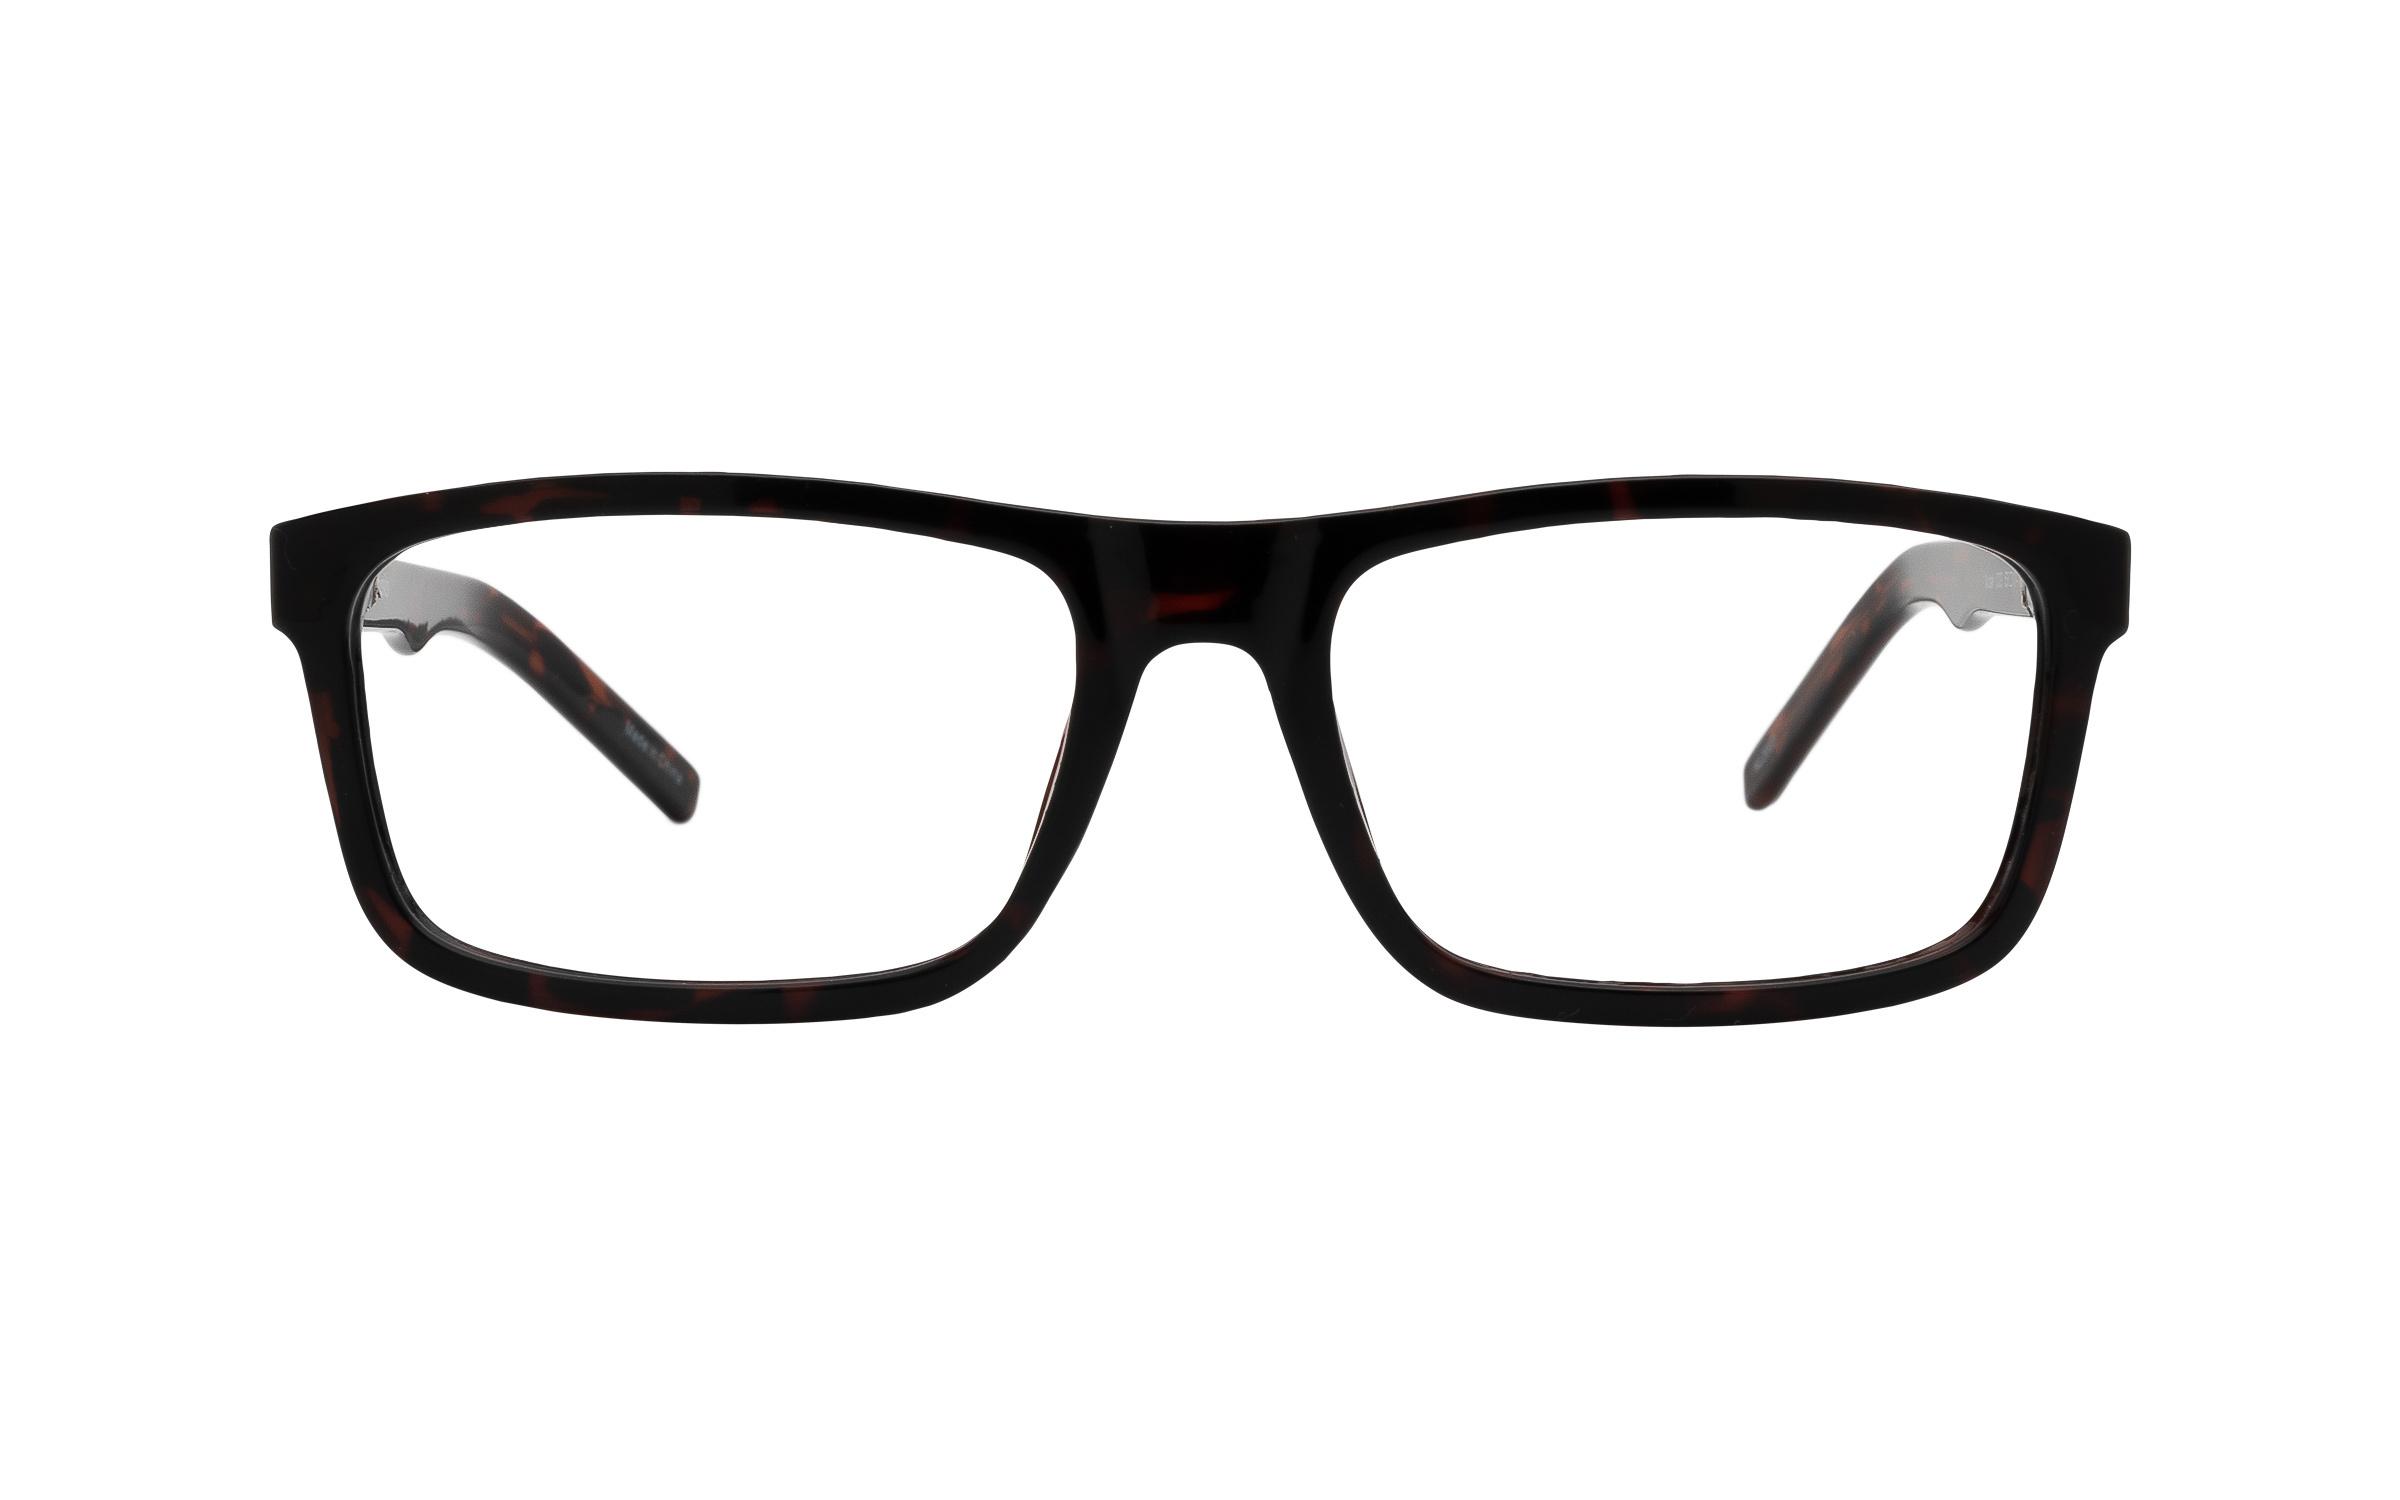 Clearly Basics Nutak COL144 C03 (53) Eyeglasses and Frame in Dark Tortoise Tortoise/Brown